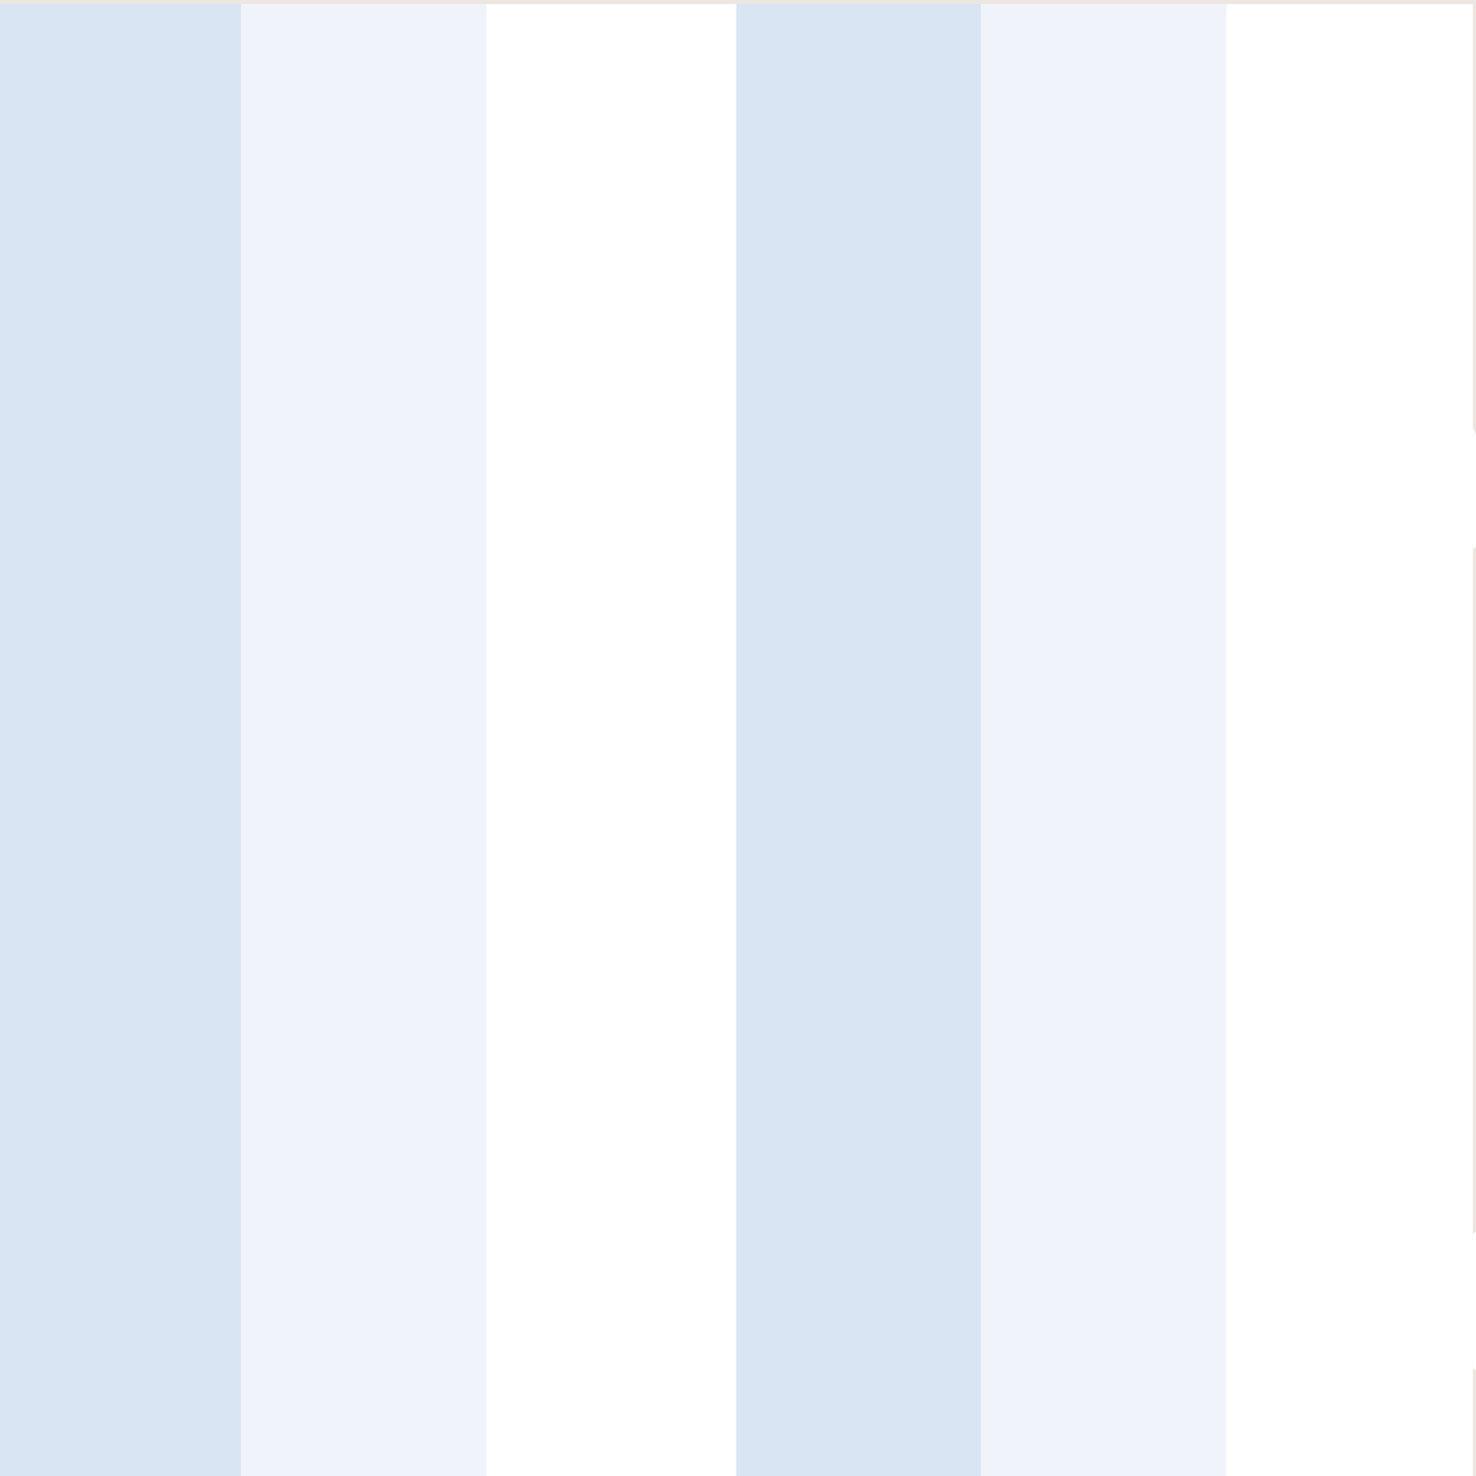 tapete papier gestreift rasch textil blau grau 330273. Black Bedroom Furniture Sets. Home Design Ideas